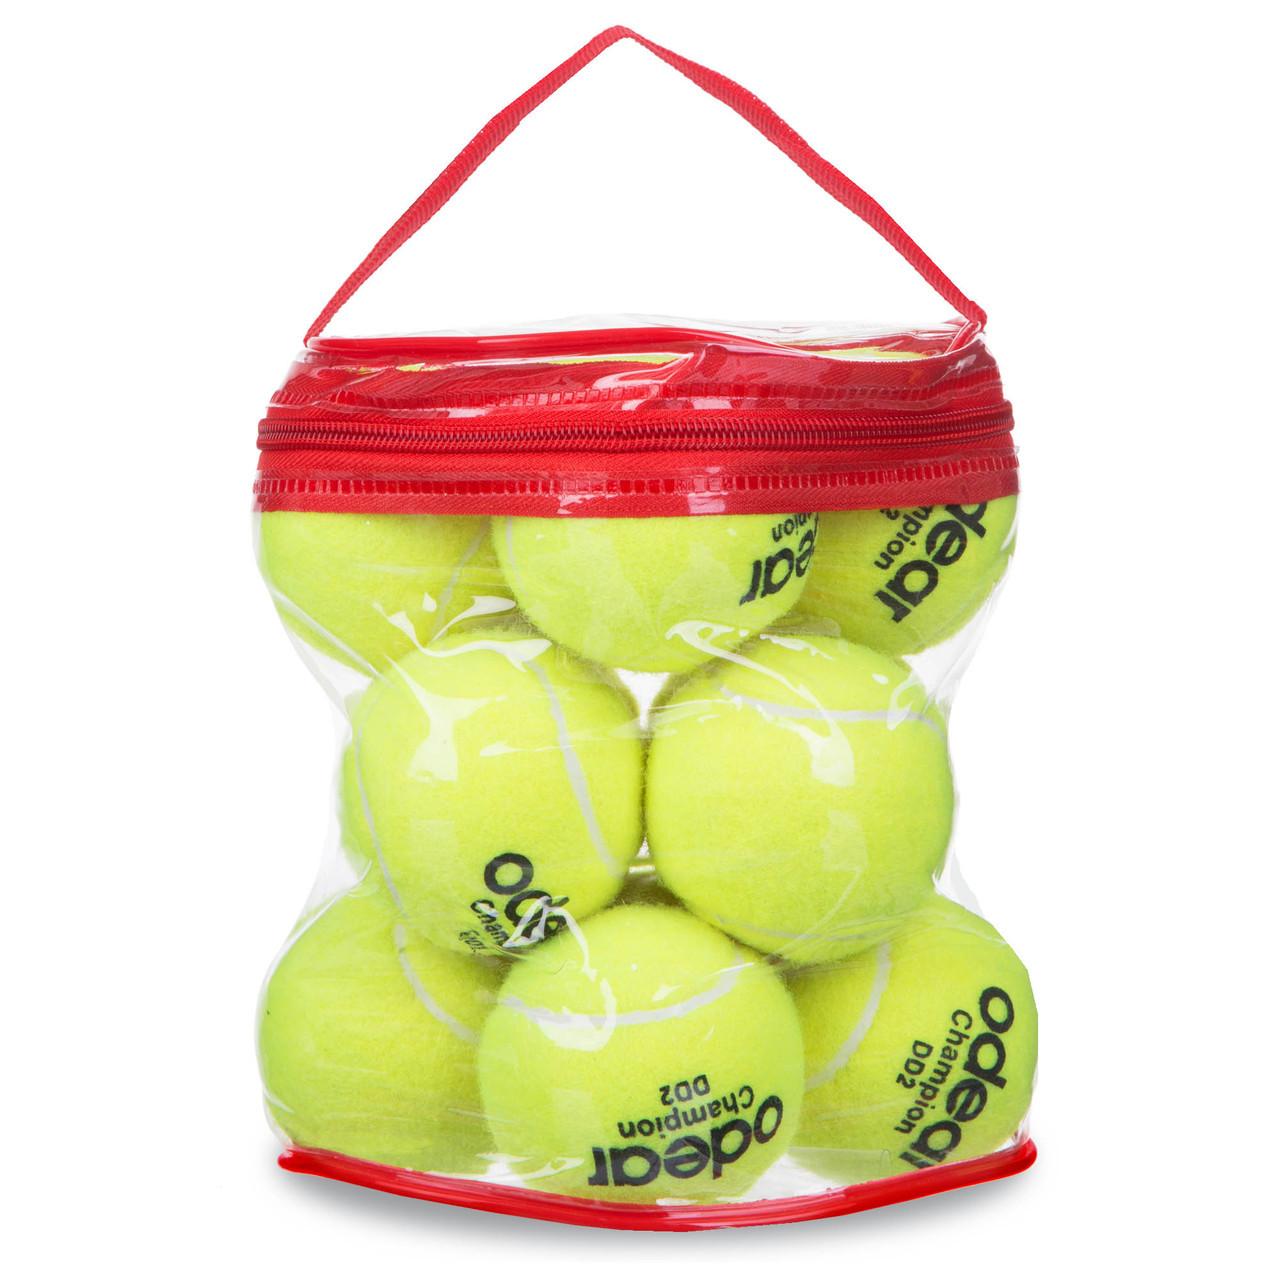 Мяч для большого тенниса (12шт) ODEAR SILVER BT-1780